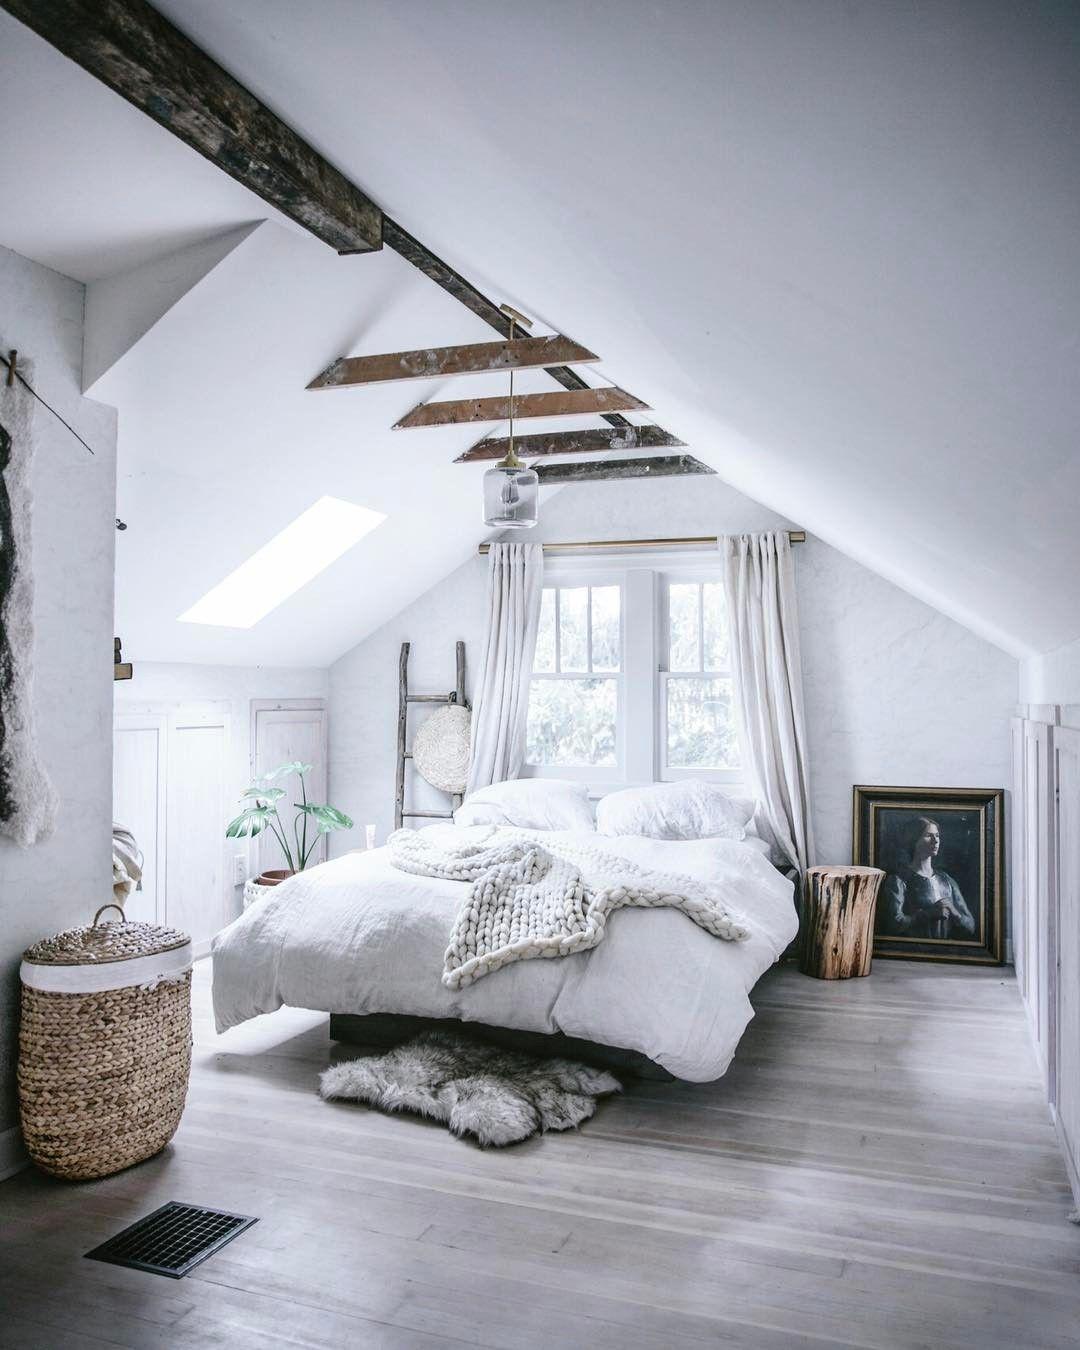 instagram evakosmasflores atmosph re pinterest chambres deco chambre et id e chambre. Black Bedroom Furniture Sets. Home Design Ideas